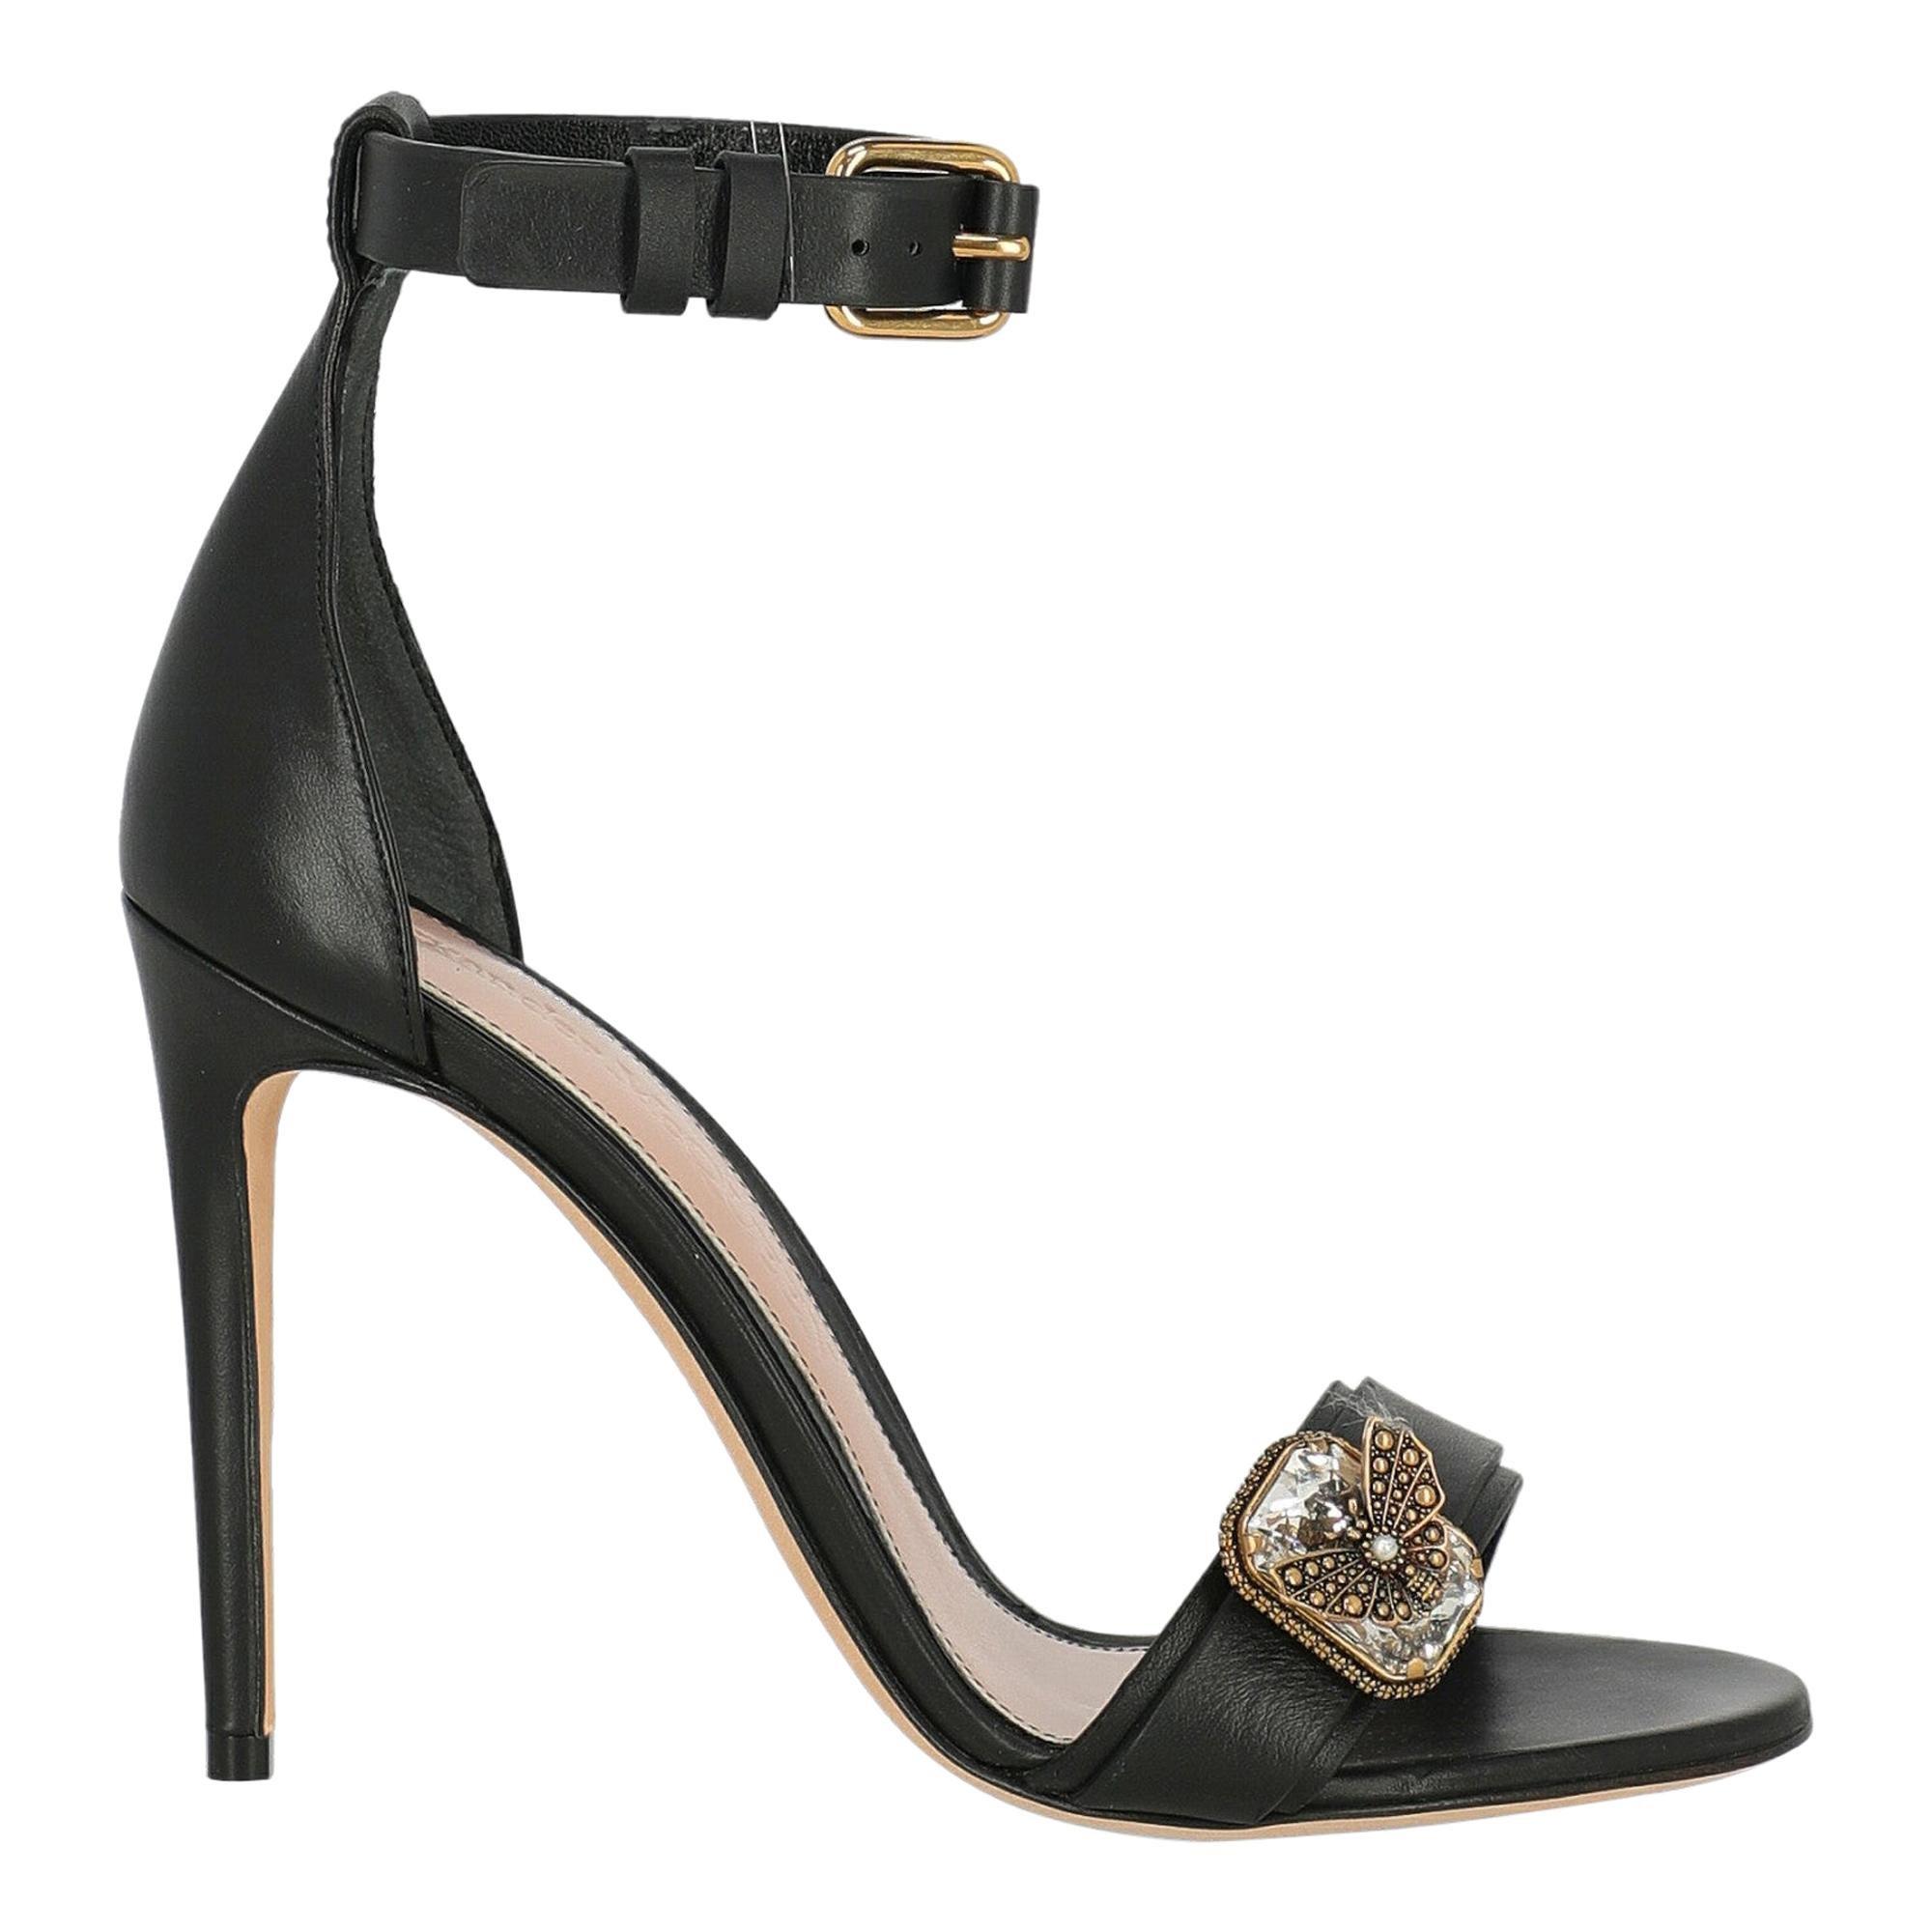 Alexander Mcqueen Woman Sandals Black Leather IT 37